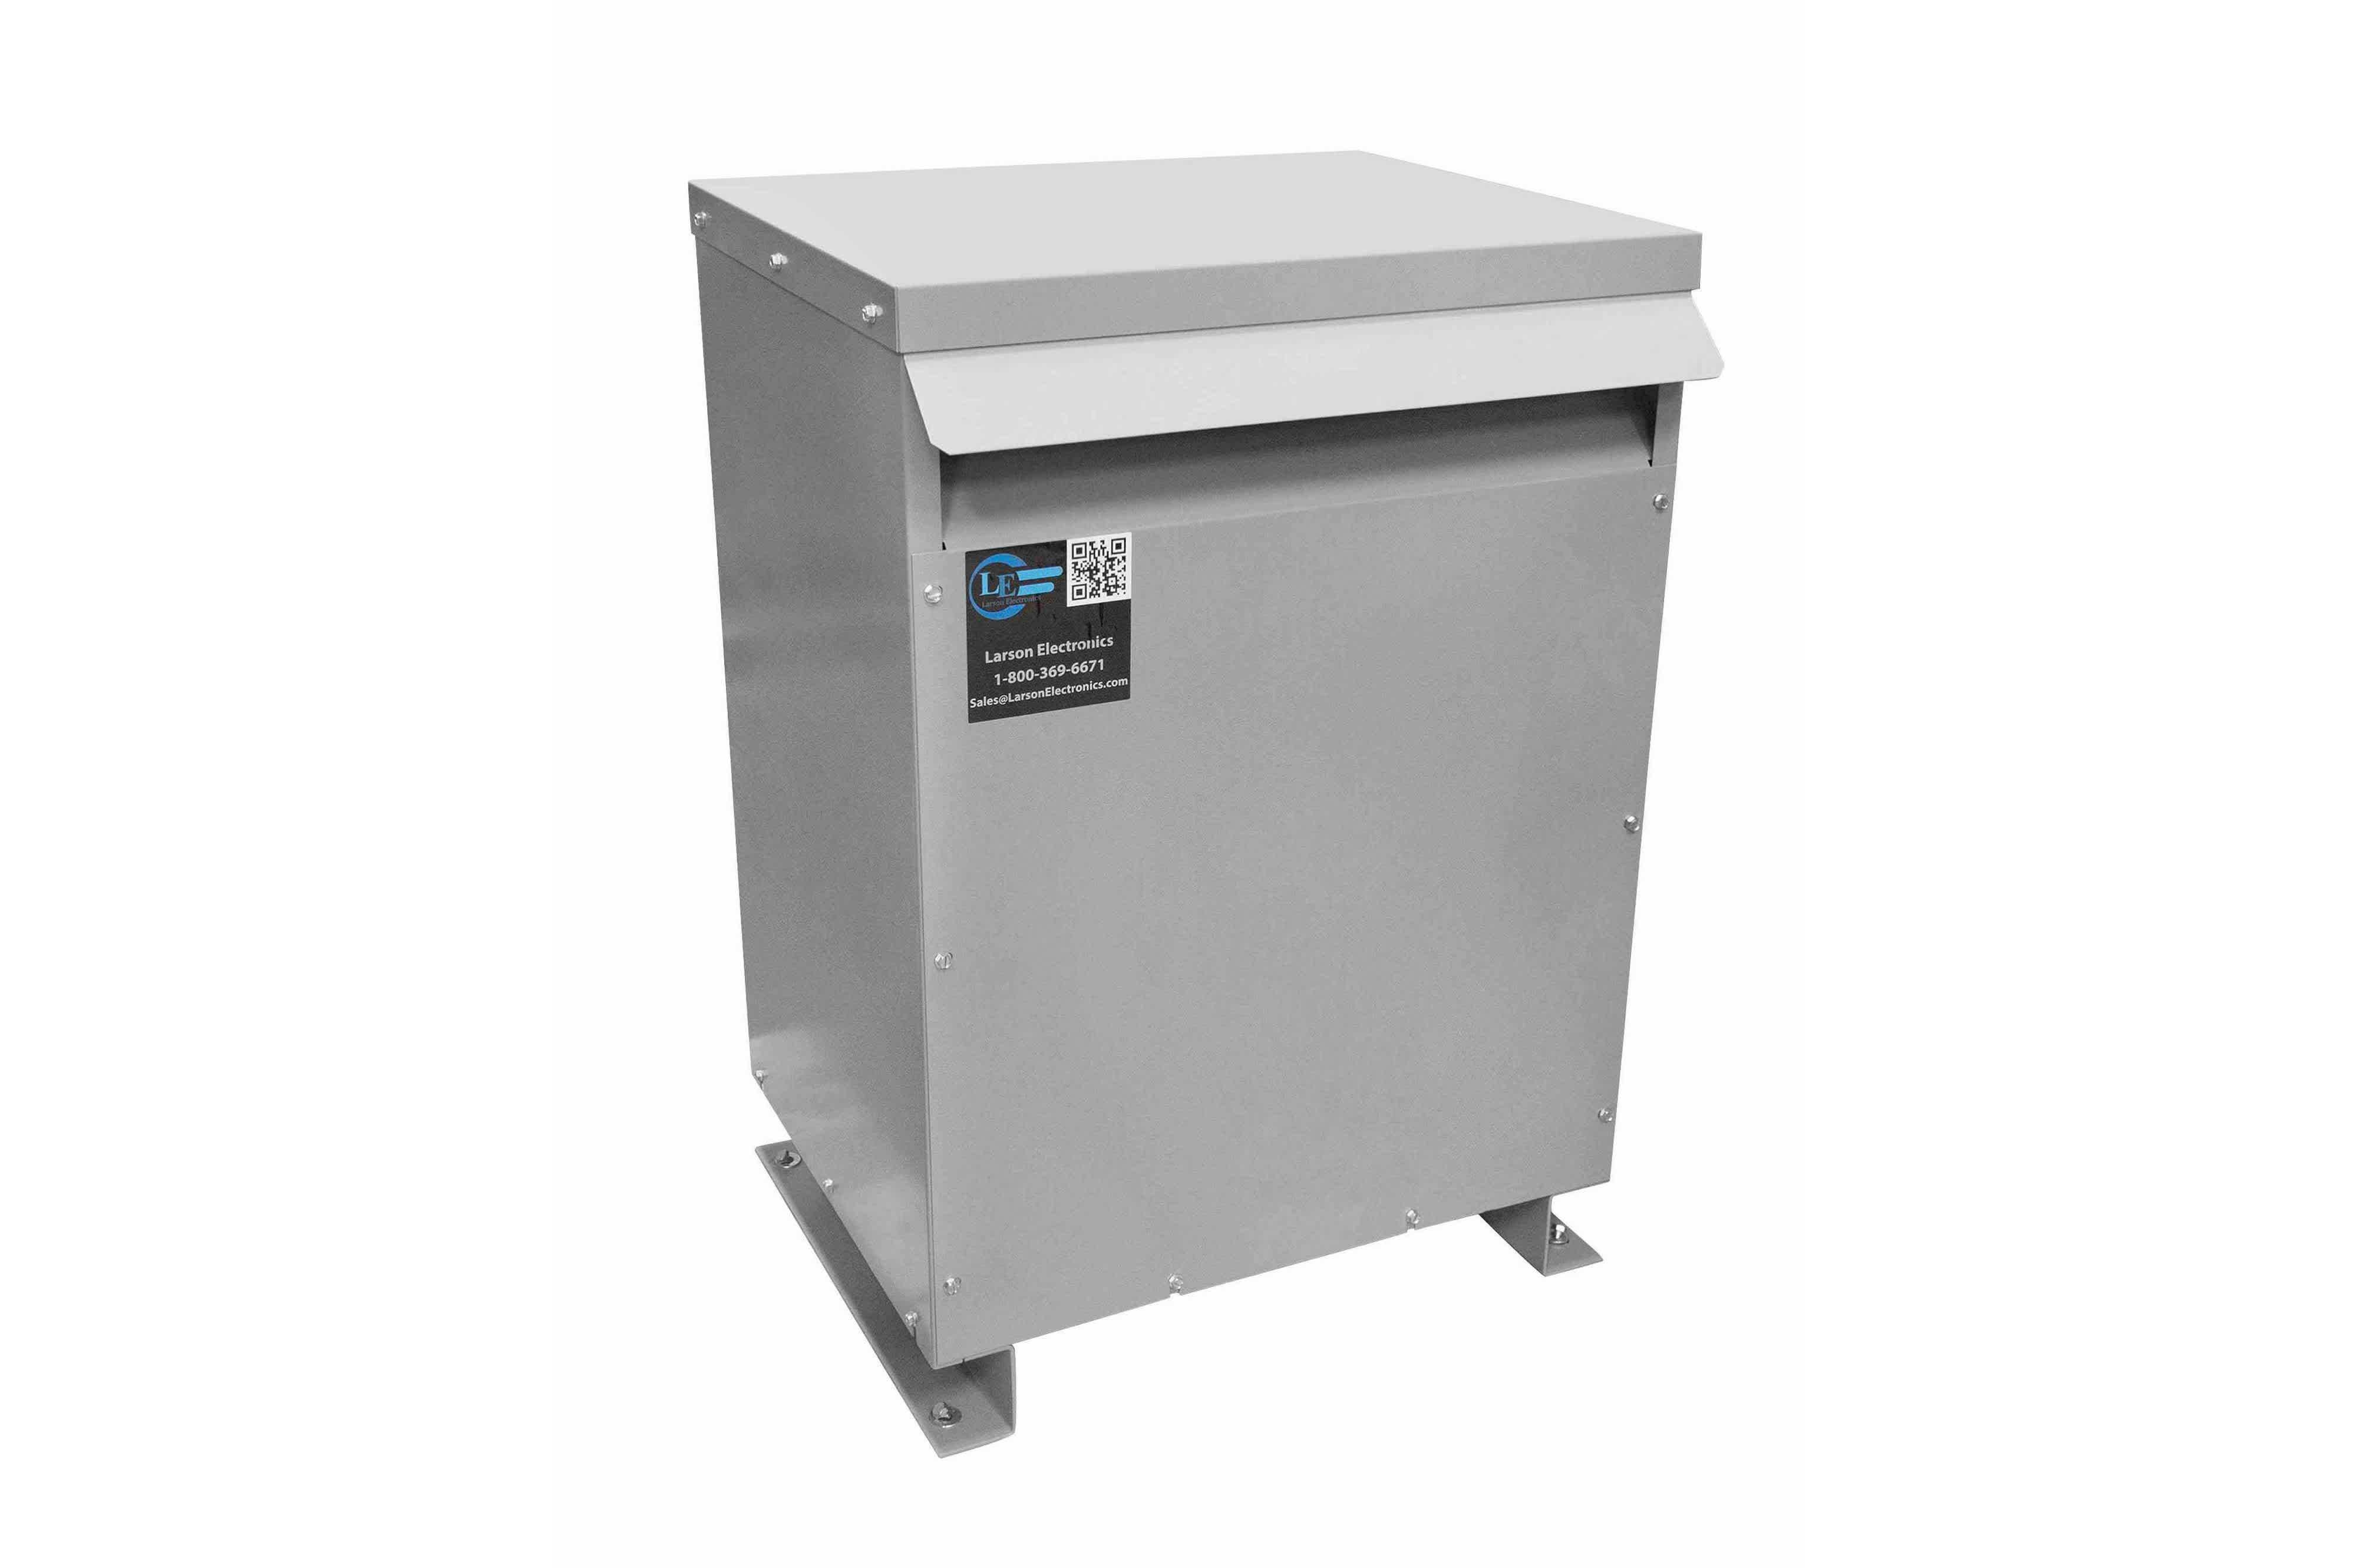 115 kVA 3PH Isolation Transformer, 480V Wye Primary, 575Y/332 Wye-N Secondary, N3R, Ventilated, 60 Hz